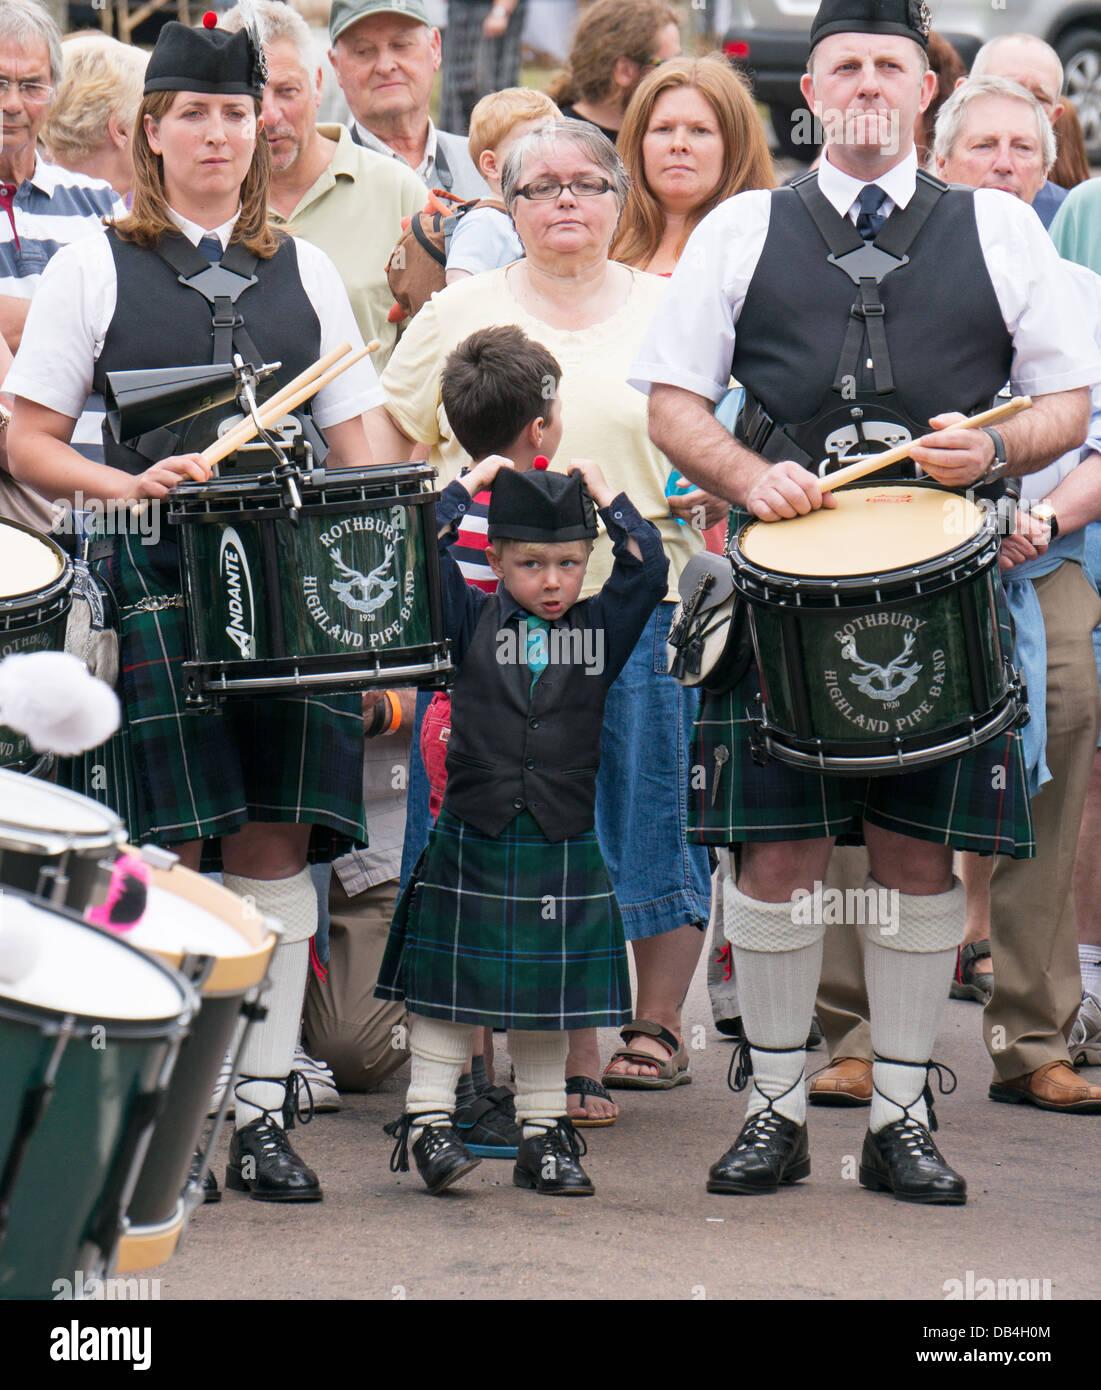 family-members-of-rothbury-highland-pipe-band-rothbury-traditional-DB4H0M.jpg